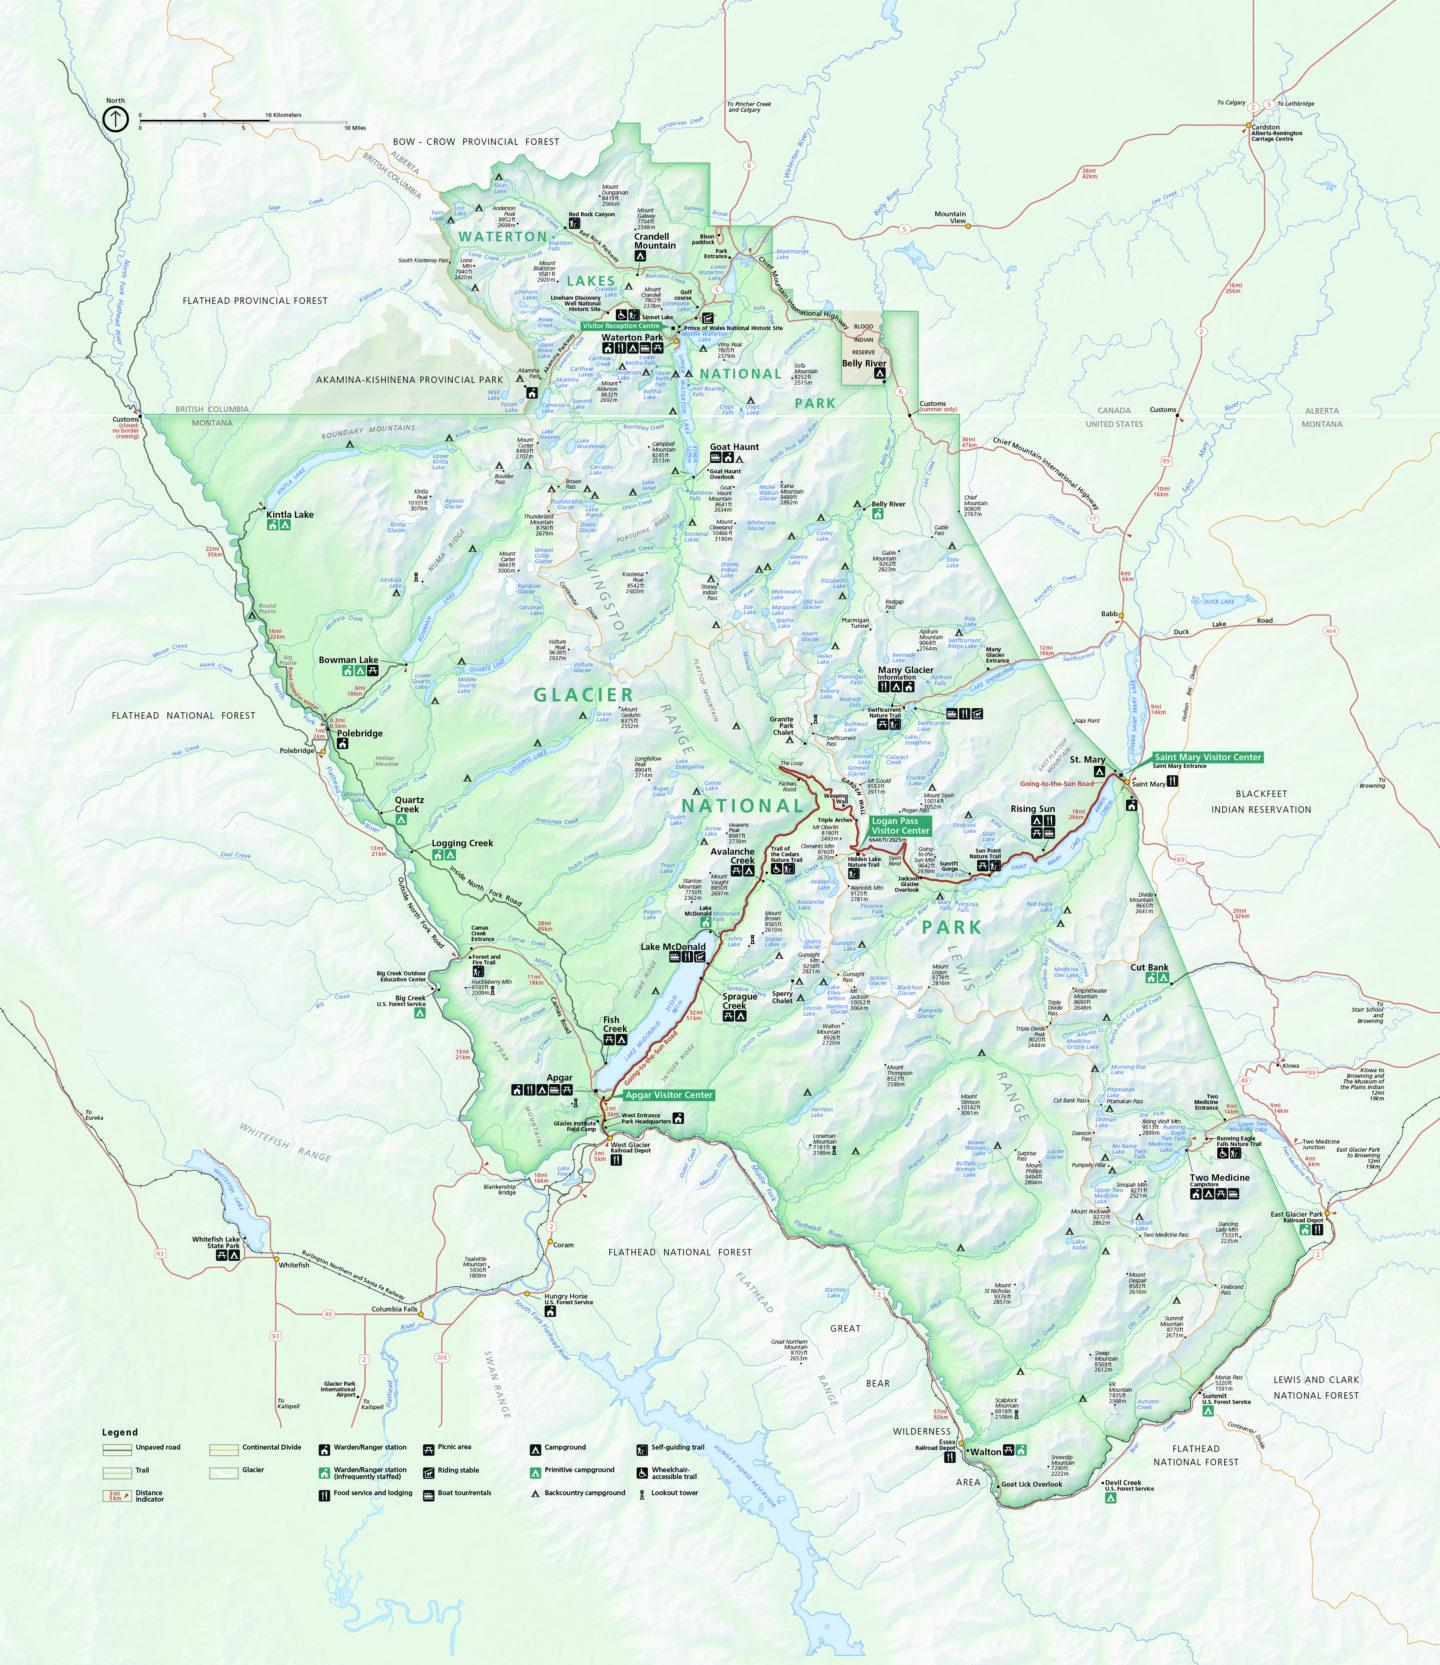 Visit Glacier National Park - Map - Roads and Destinations